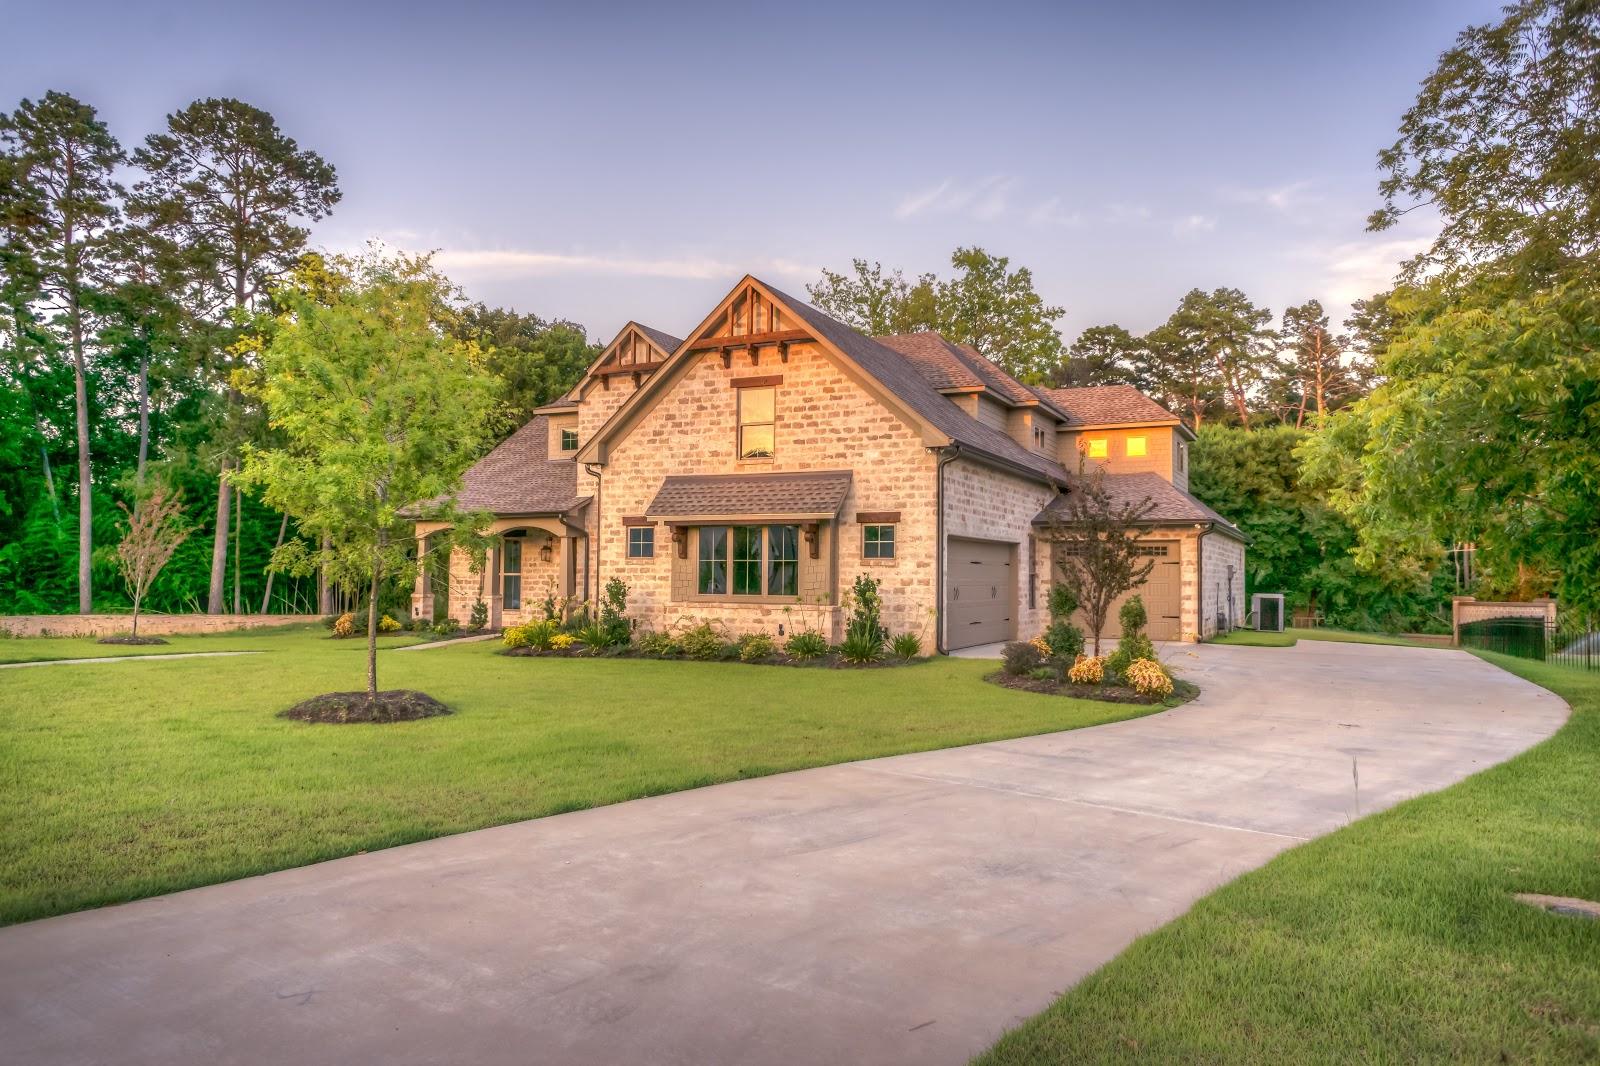 Vacation rentals in Colorado | Peak Property Management